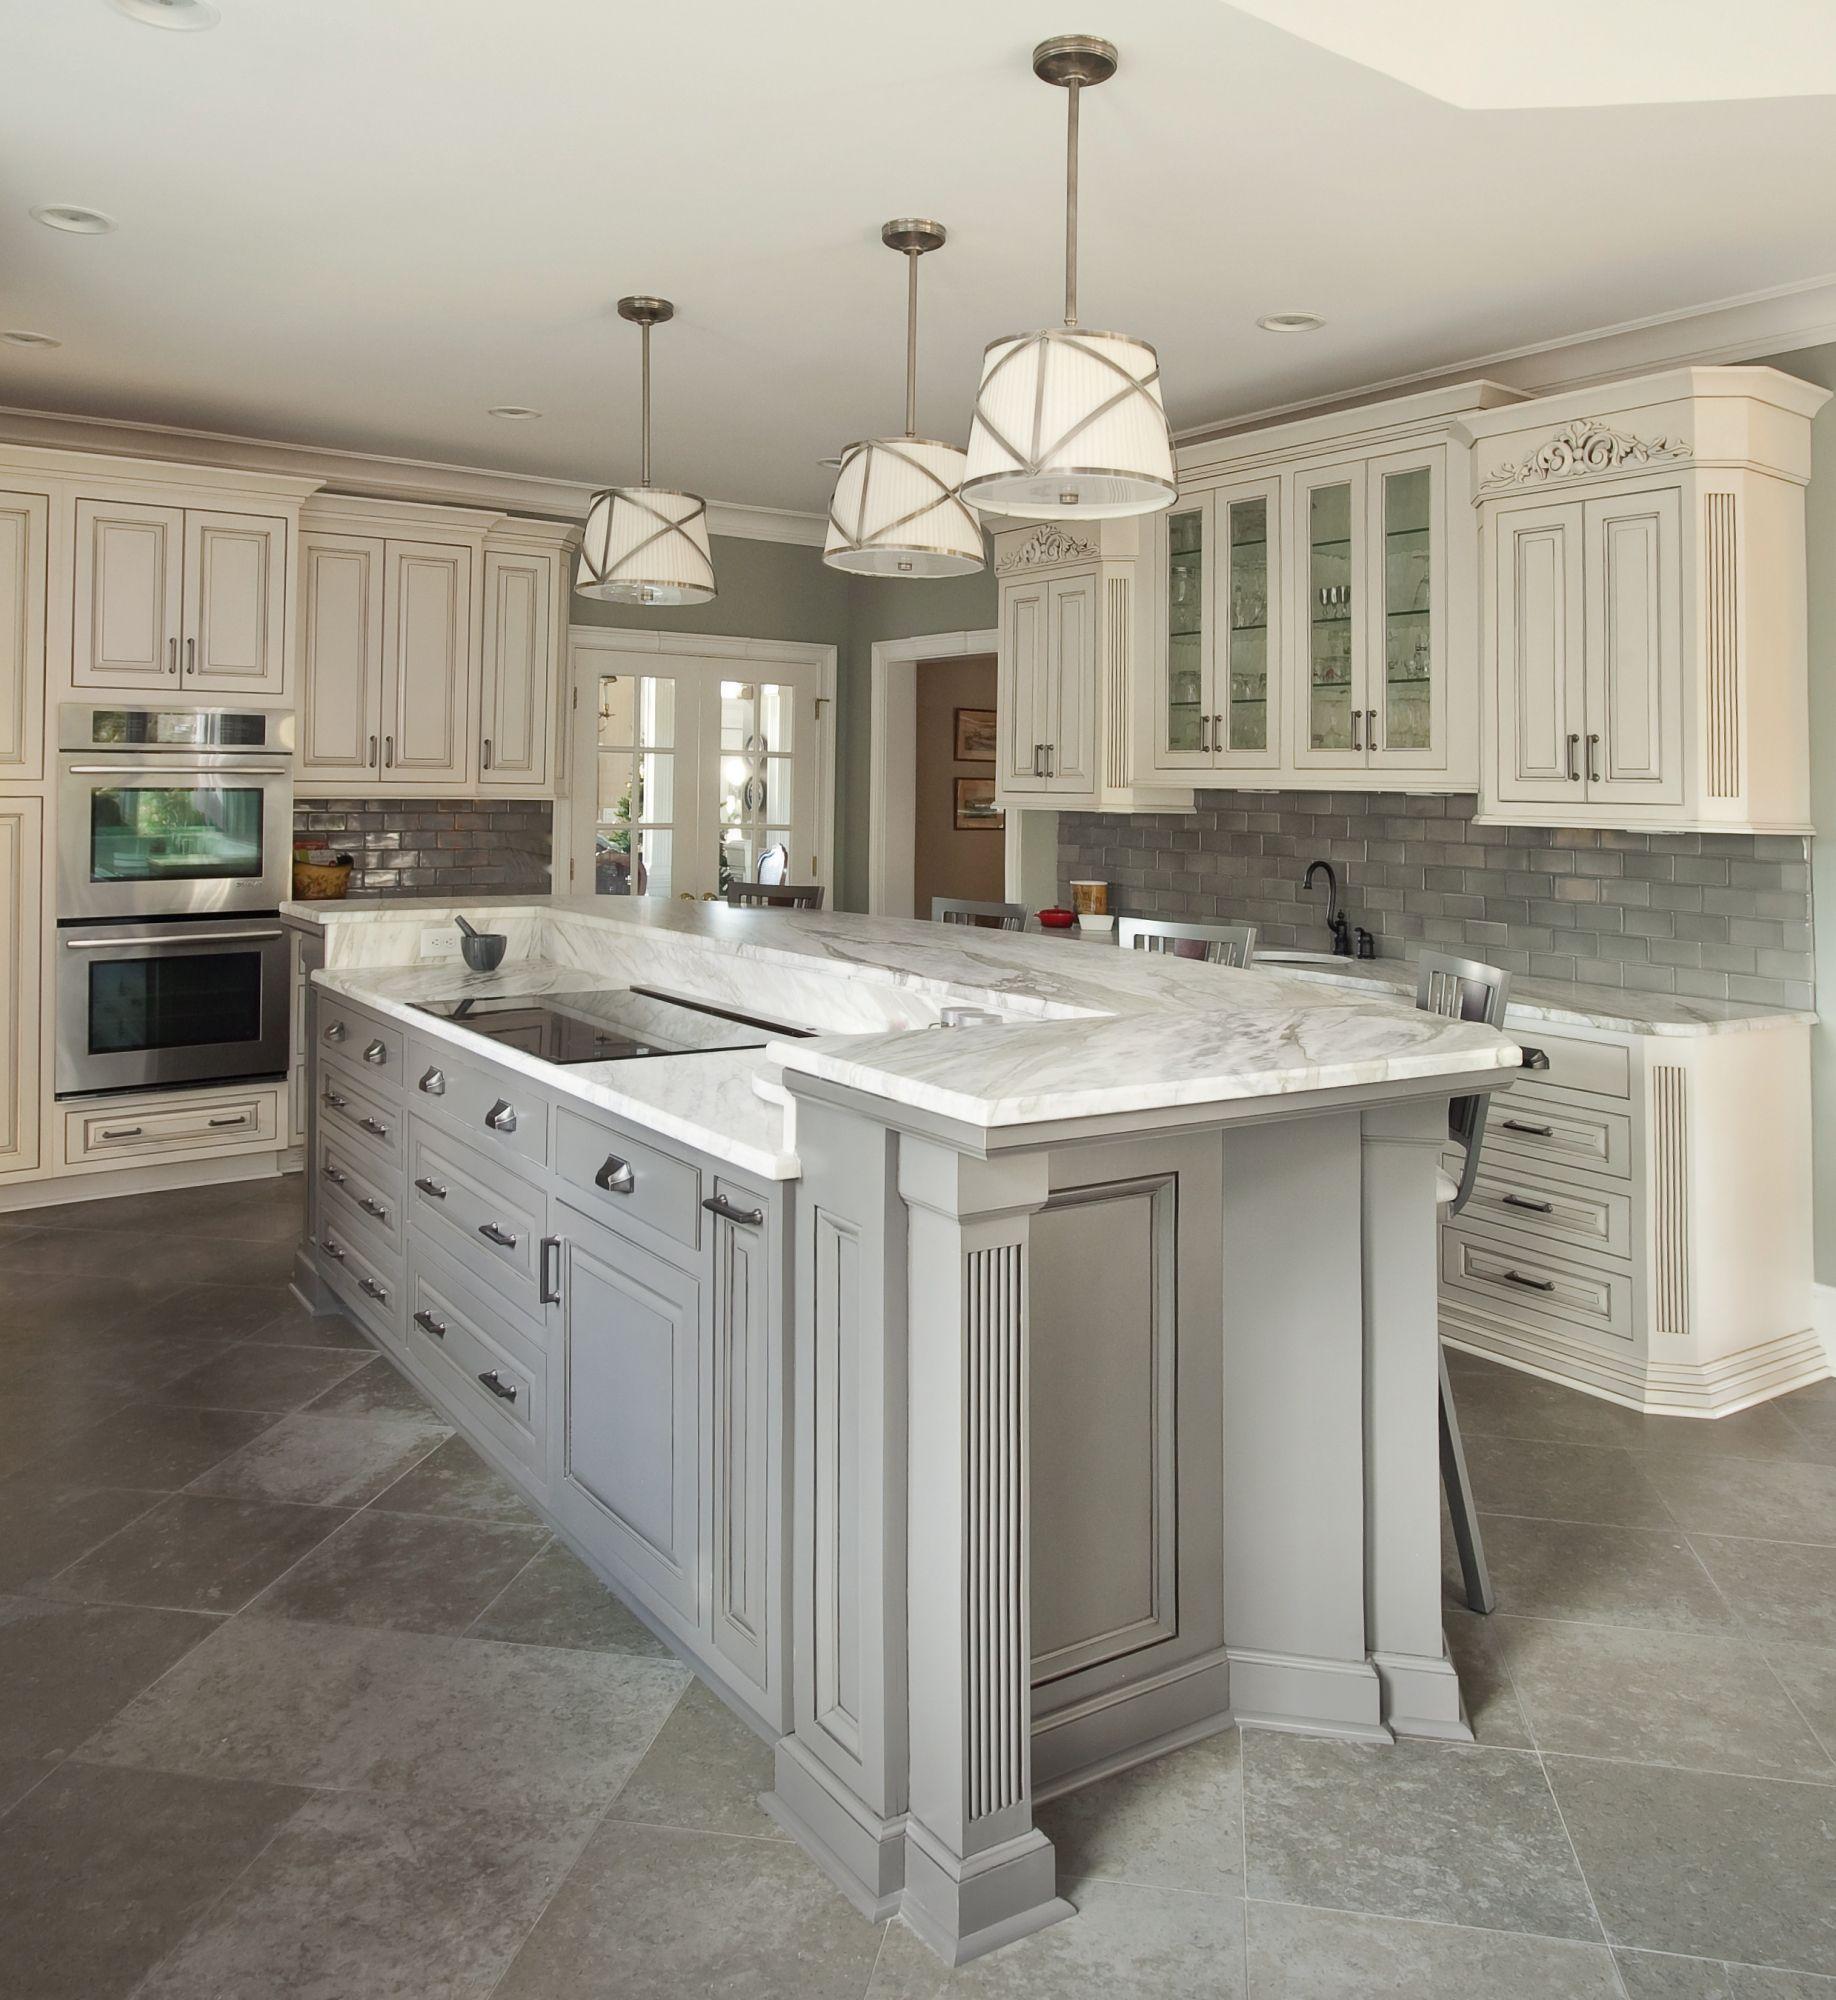 Gray Galley Kitchen: Plantation #kitchen With Grey Island & Tile Backsplash